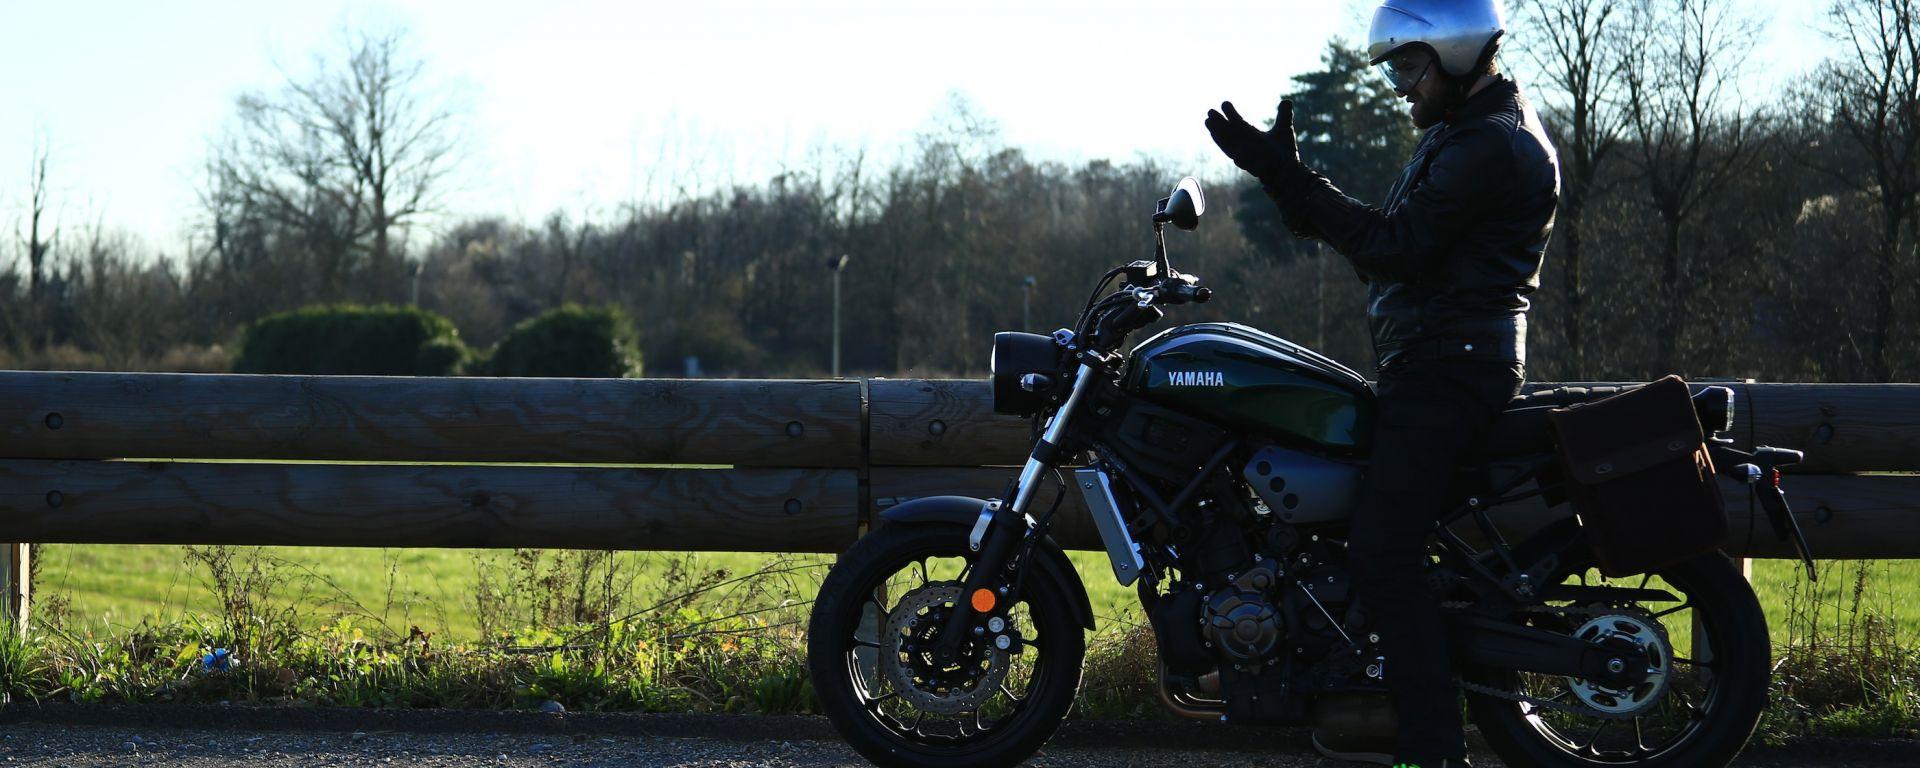 Yamaha XSR700: giorno 4